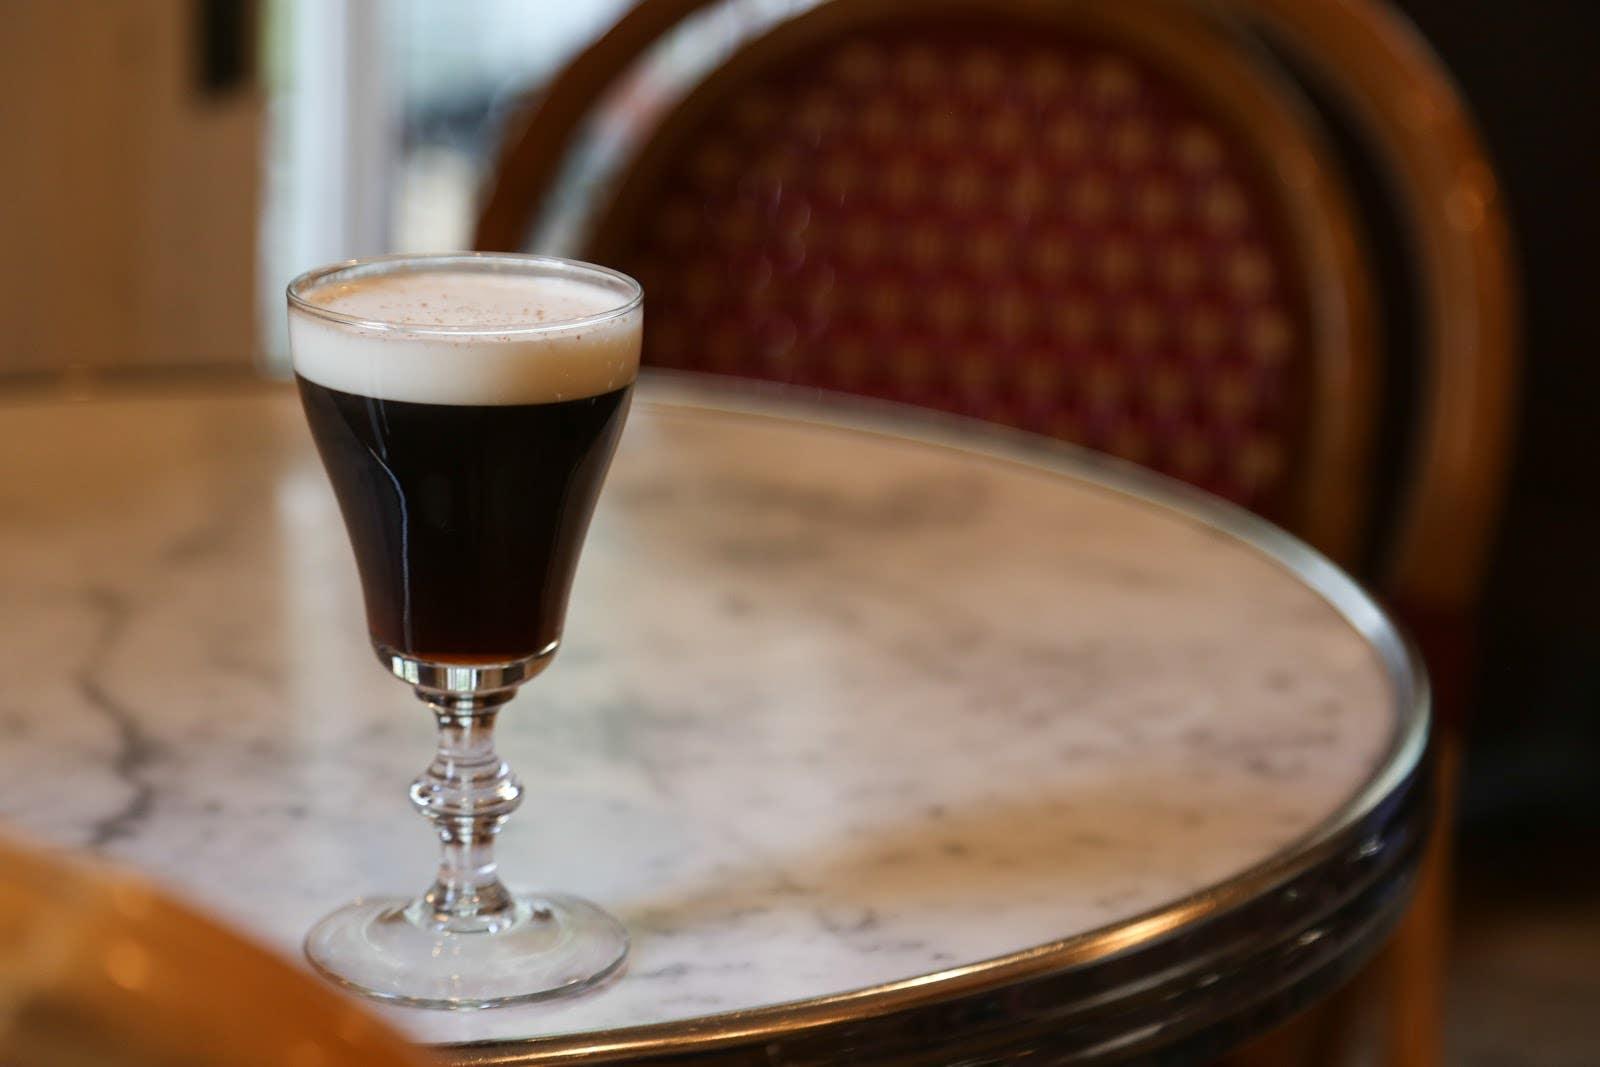 Irish Coffee at Big Bar on St. Patrick's Day